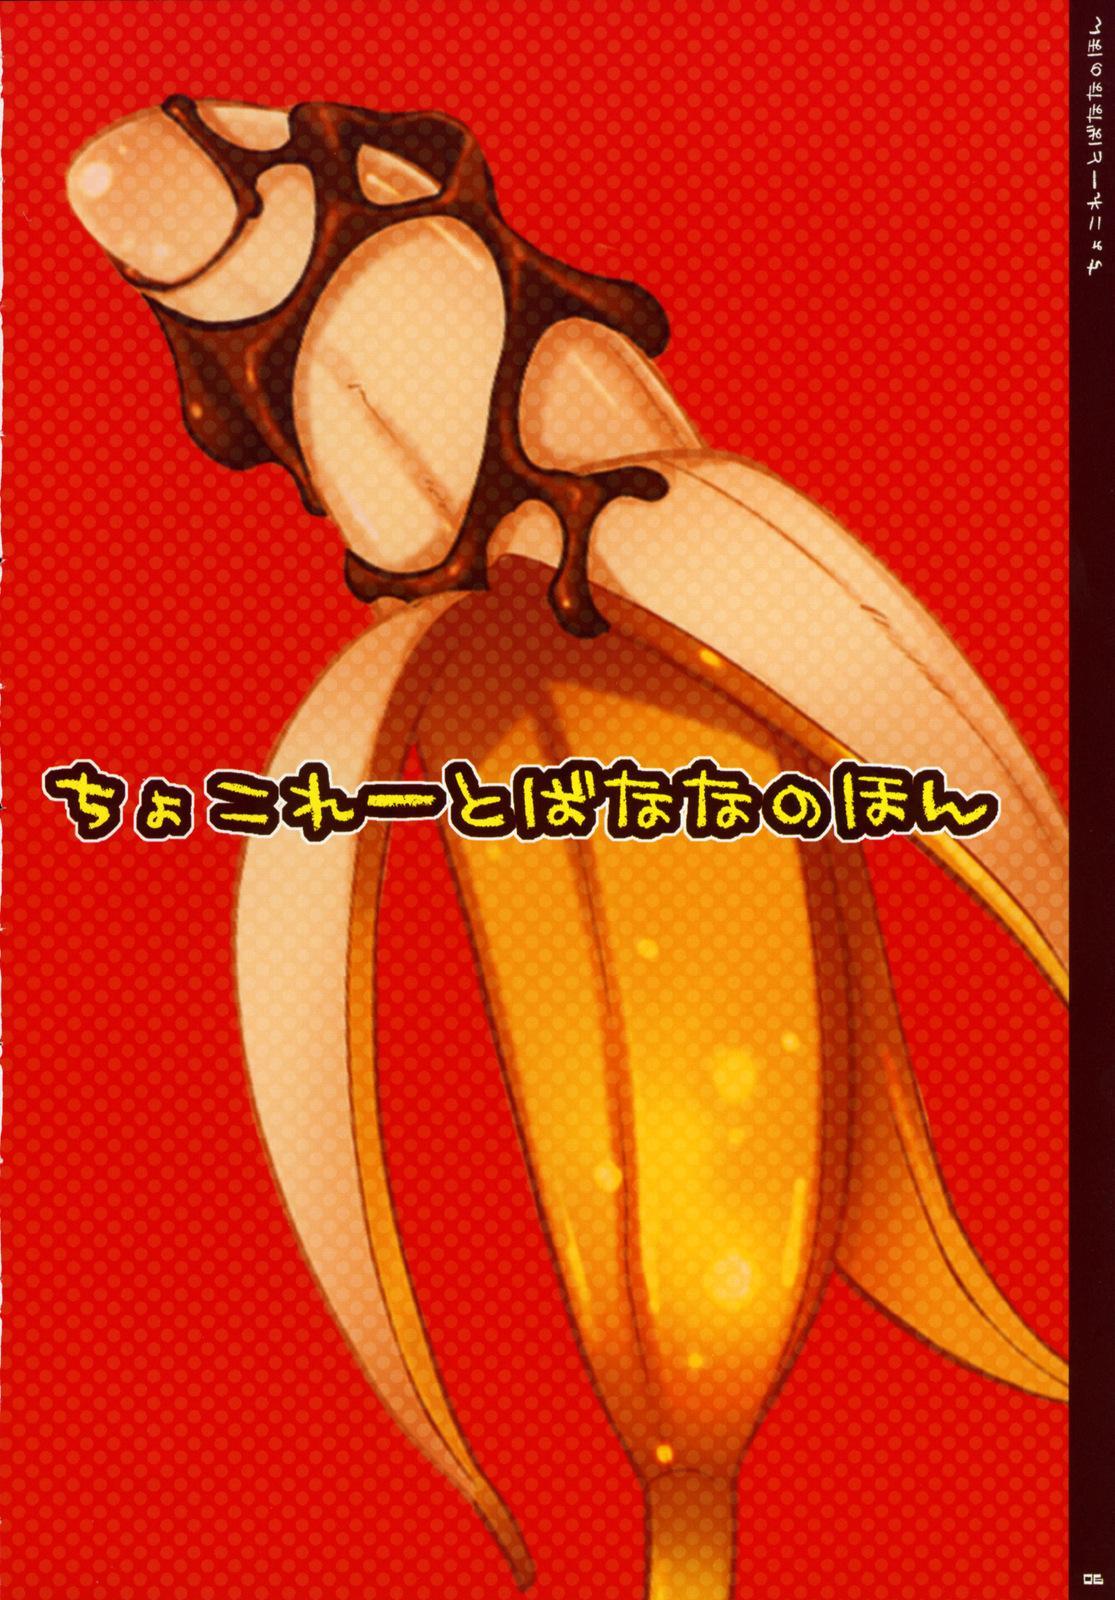 Chocolate Banana no Hon 2 4